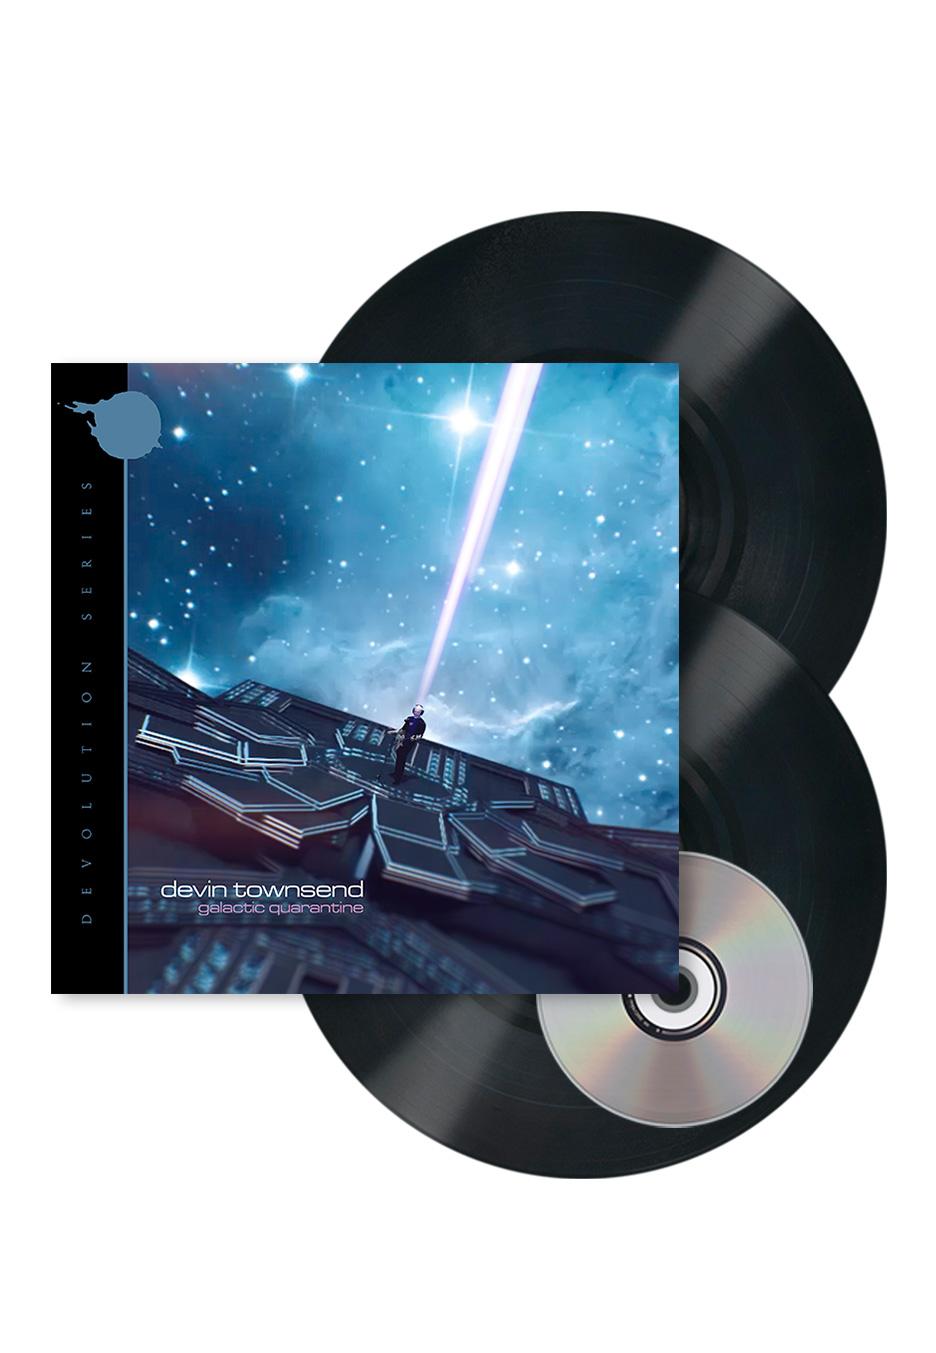 Devin Townsend - Devolution Series #2 - Galactic Quarantine - Vinyl